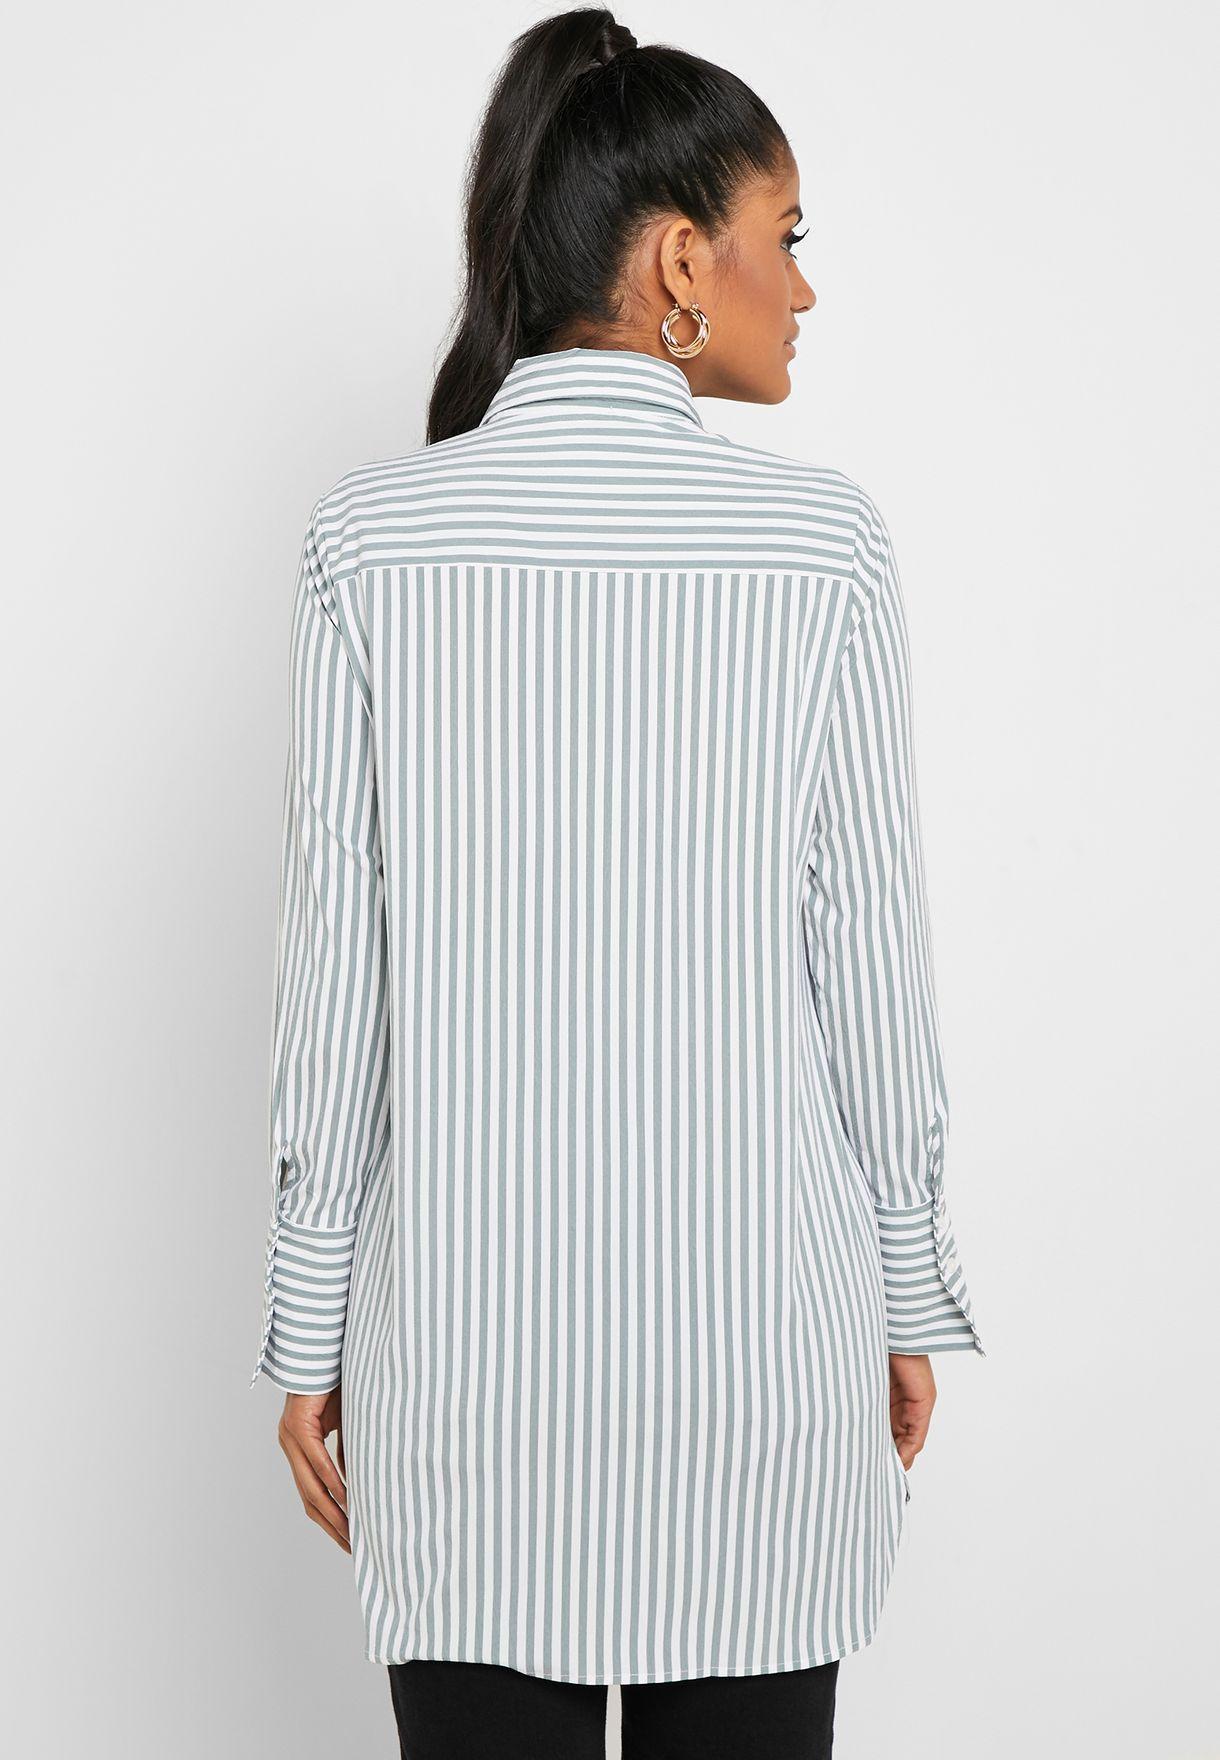 Striped Tunic Shirt